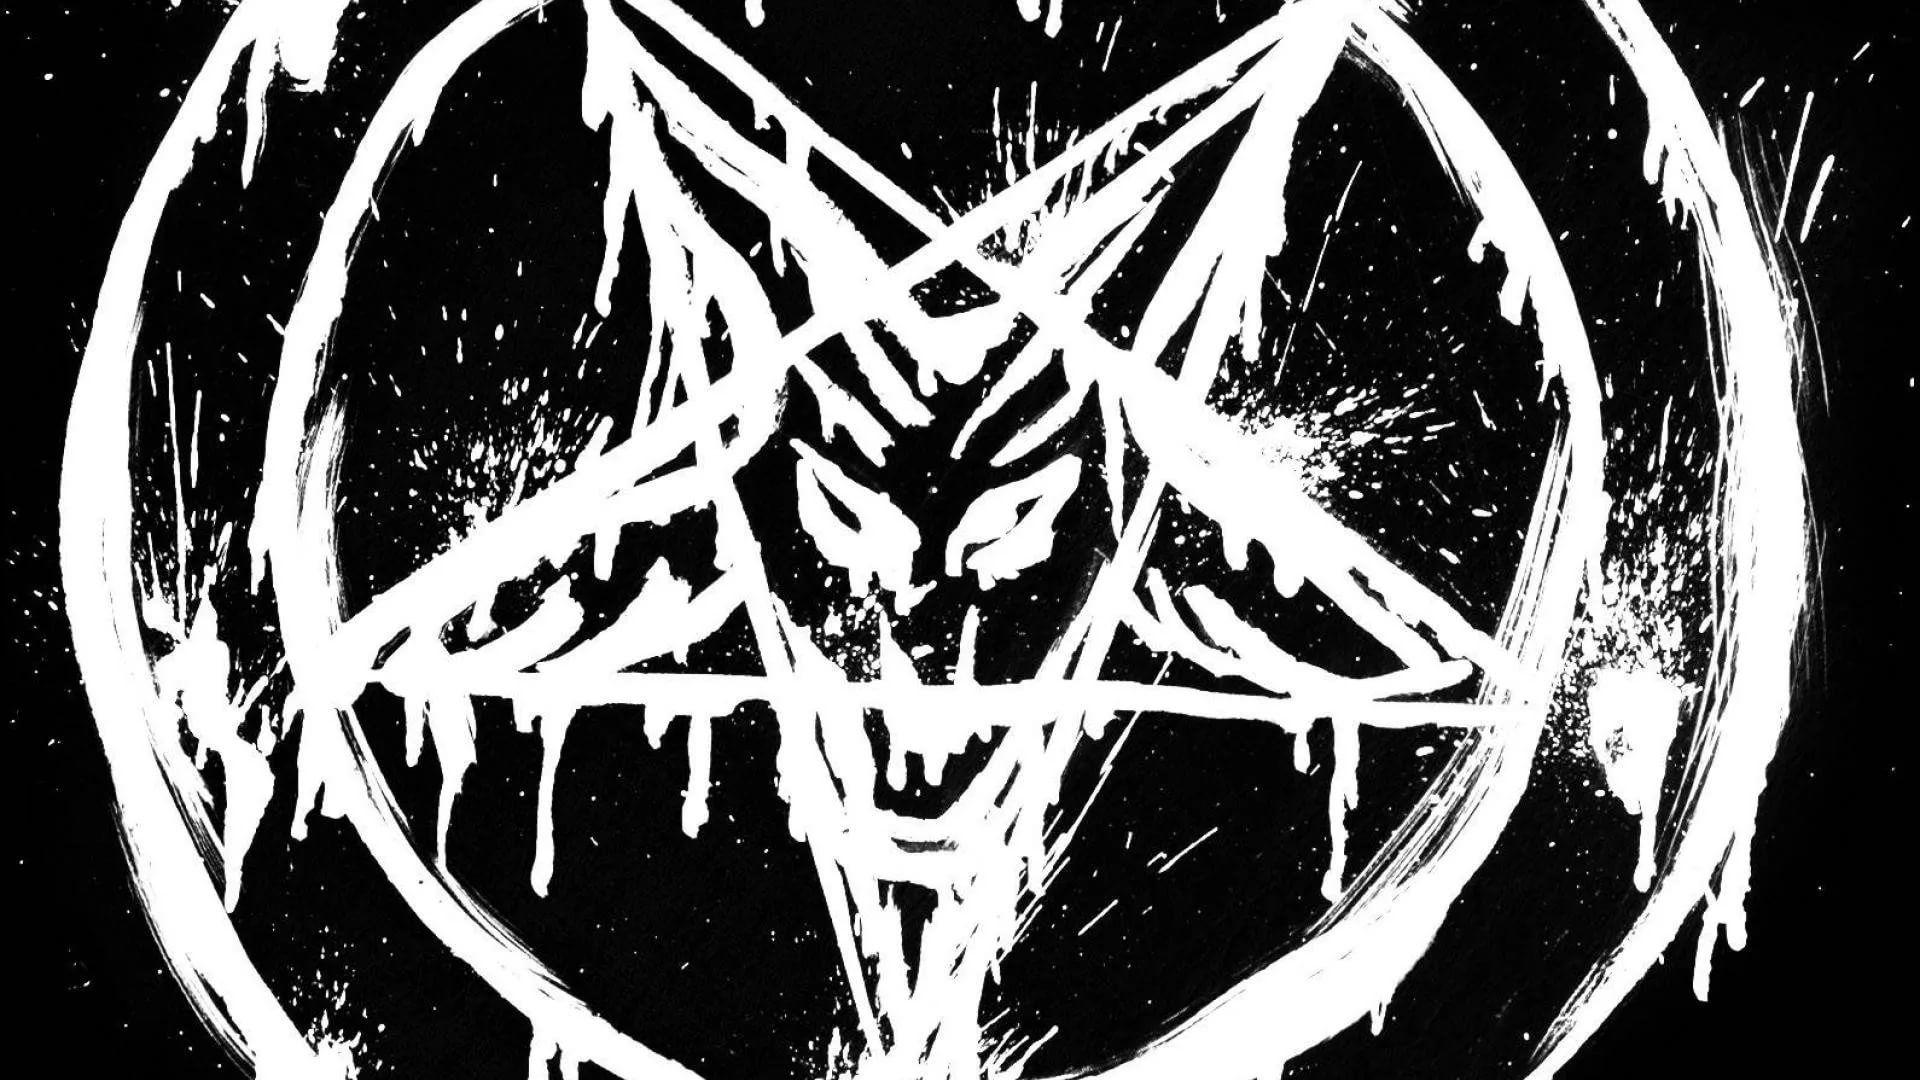 Satanic Free Wallpaper